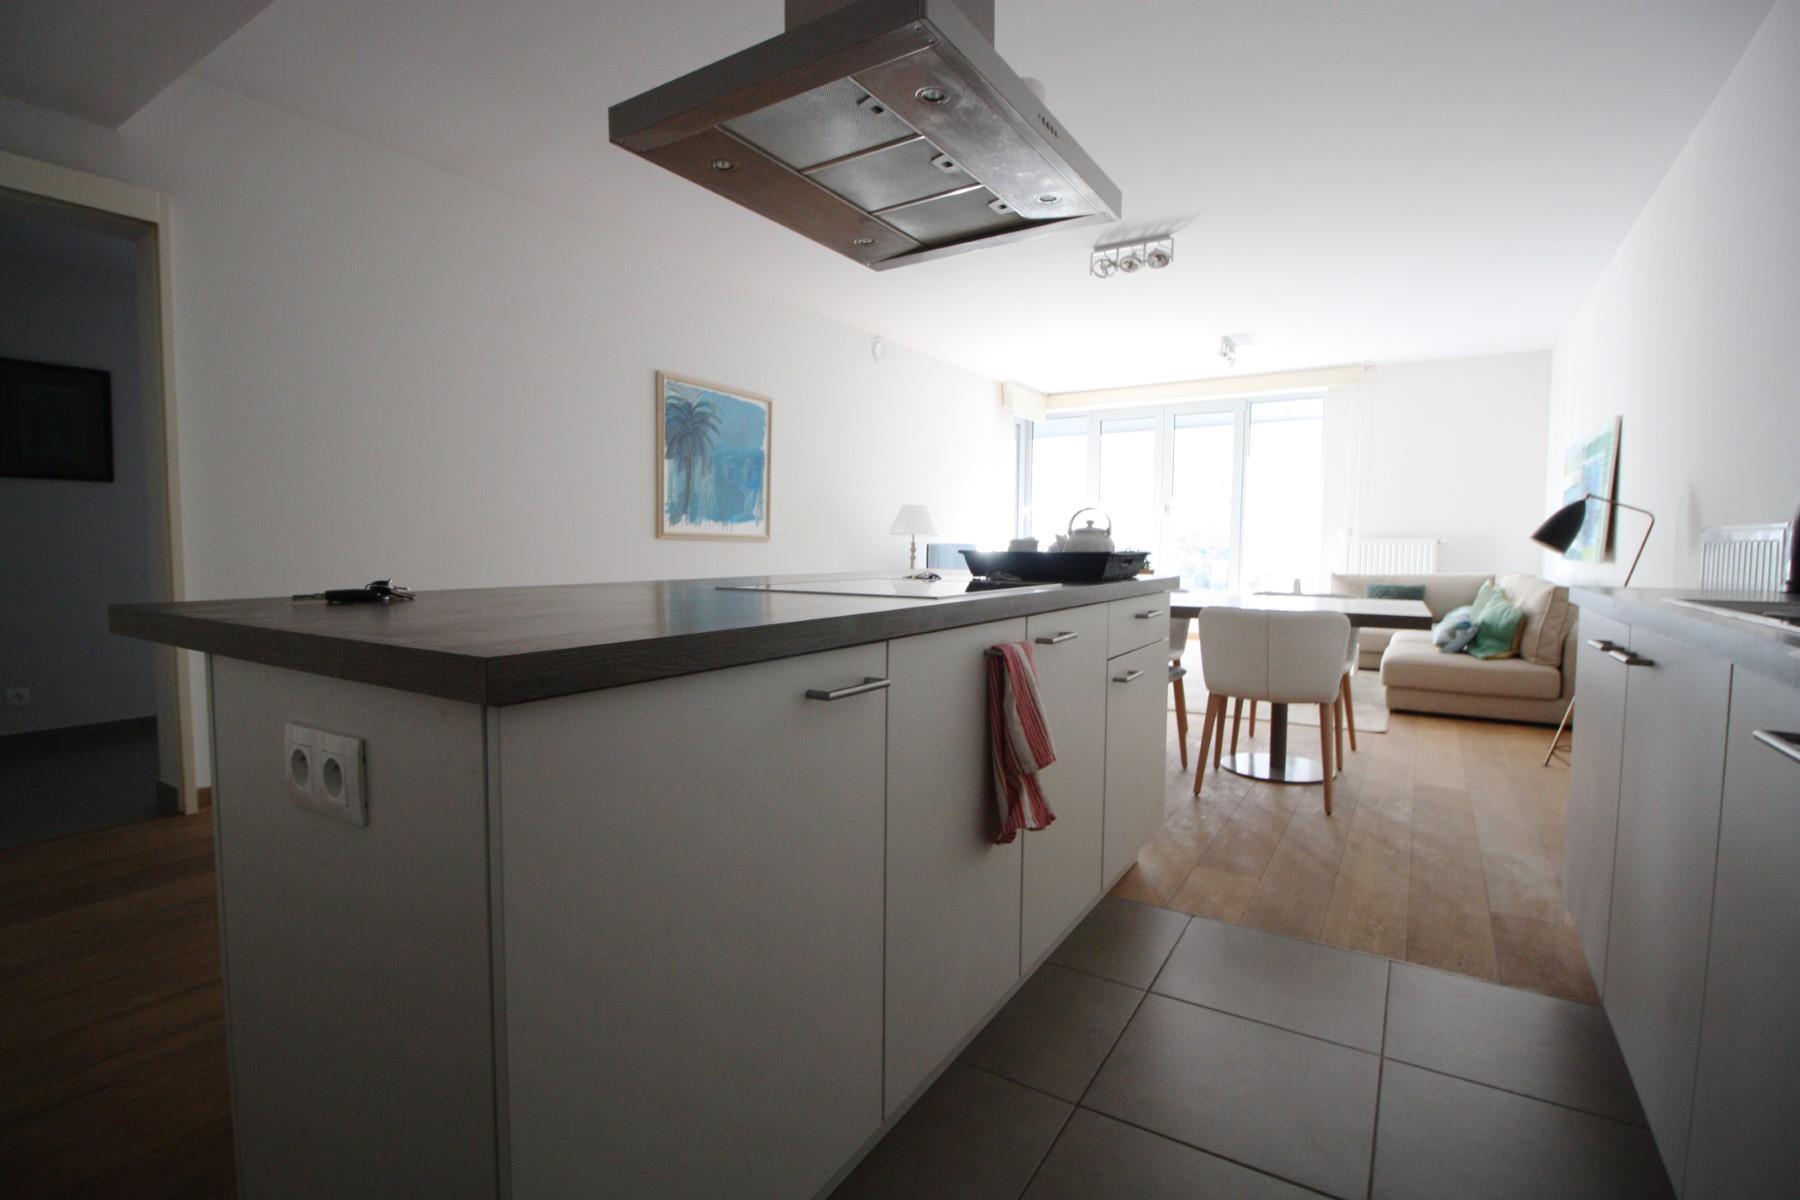 Flat - Etterbeek - #4527457-12